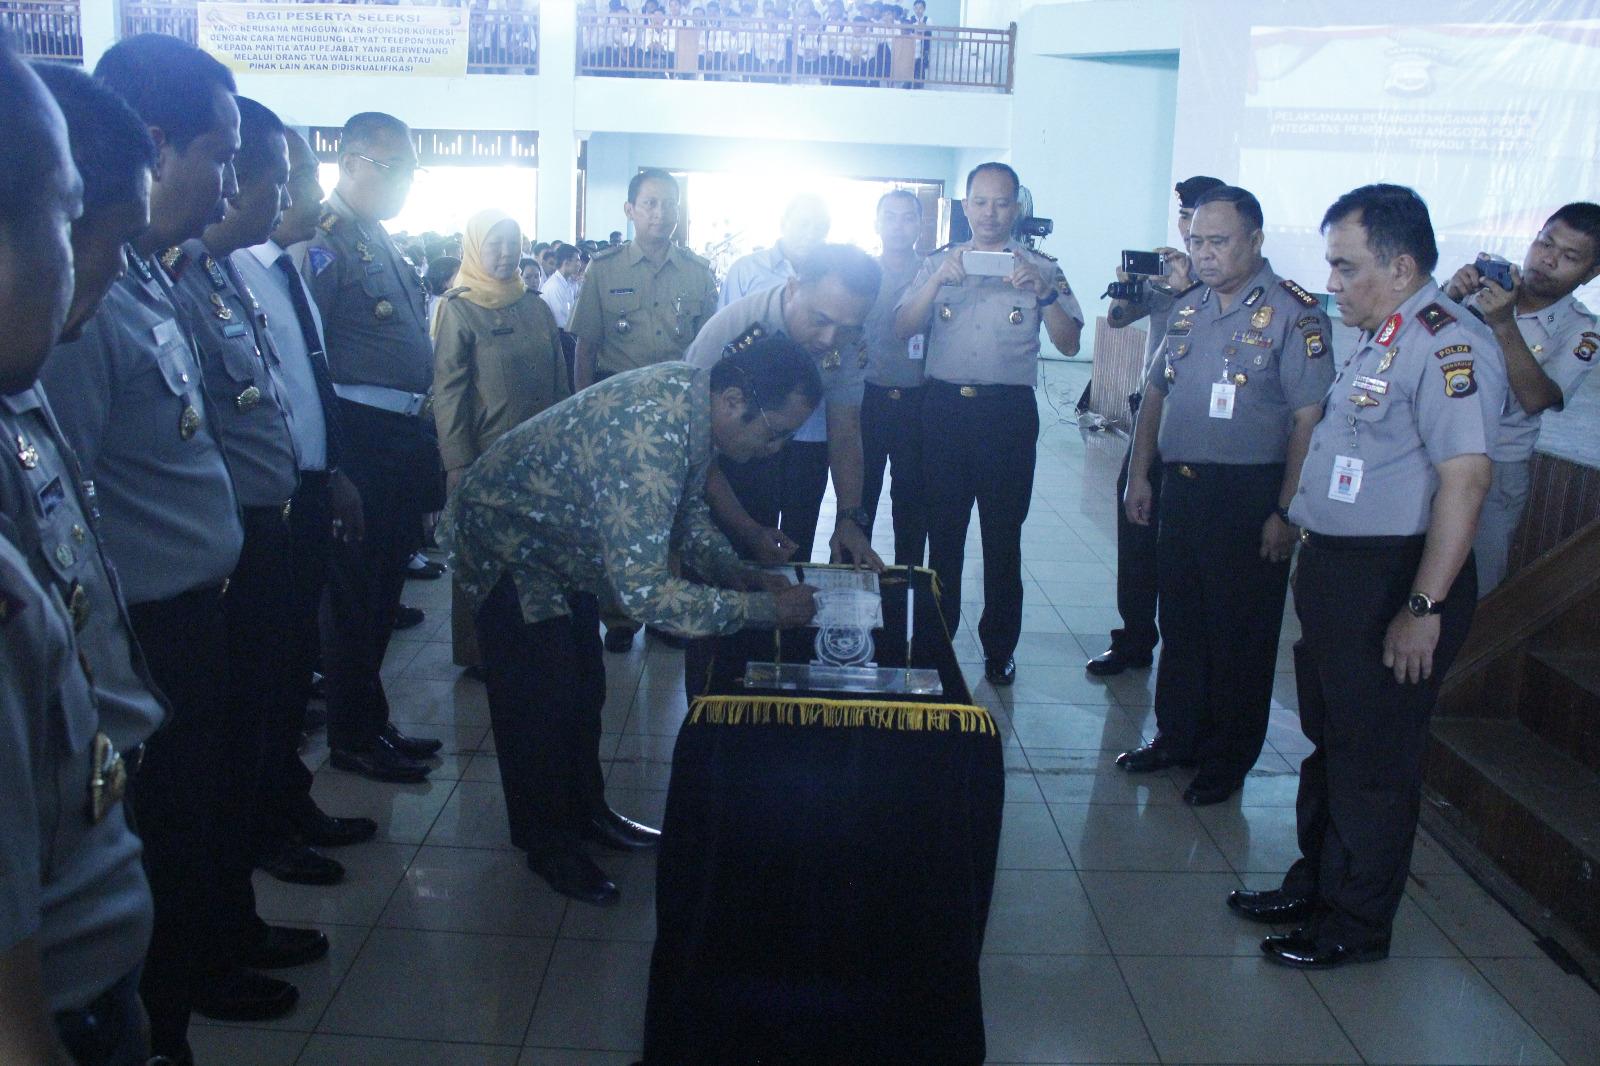 Penandatanganan Pakta Integritas Dihadiri Ribuan Calon Anggota Polri